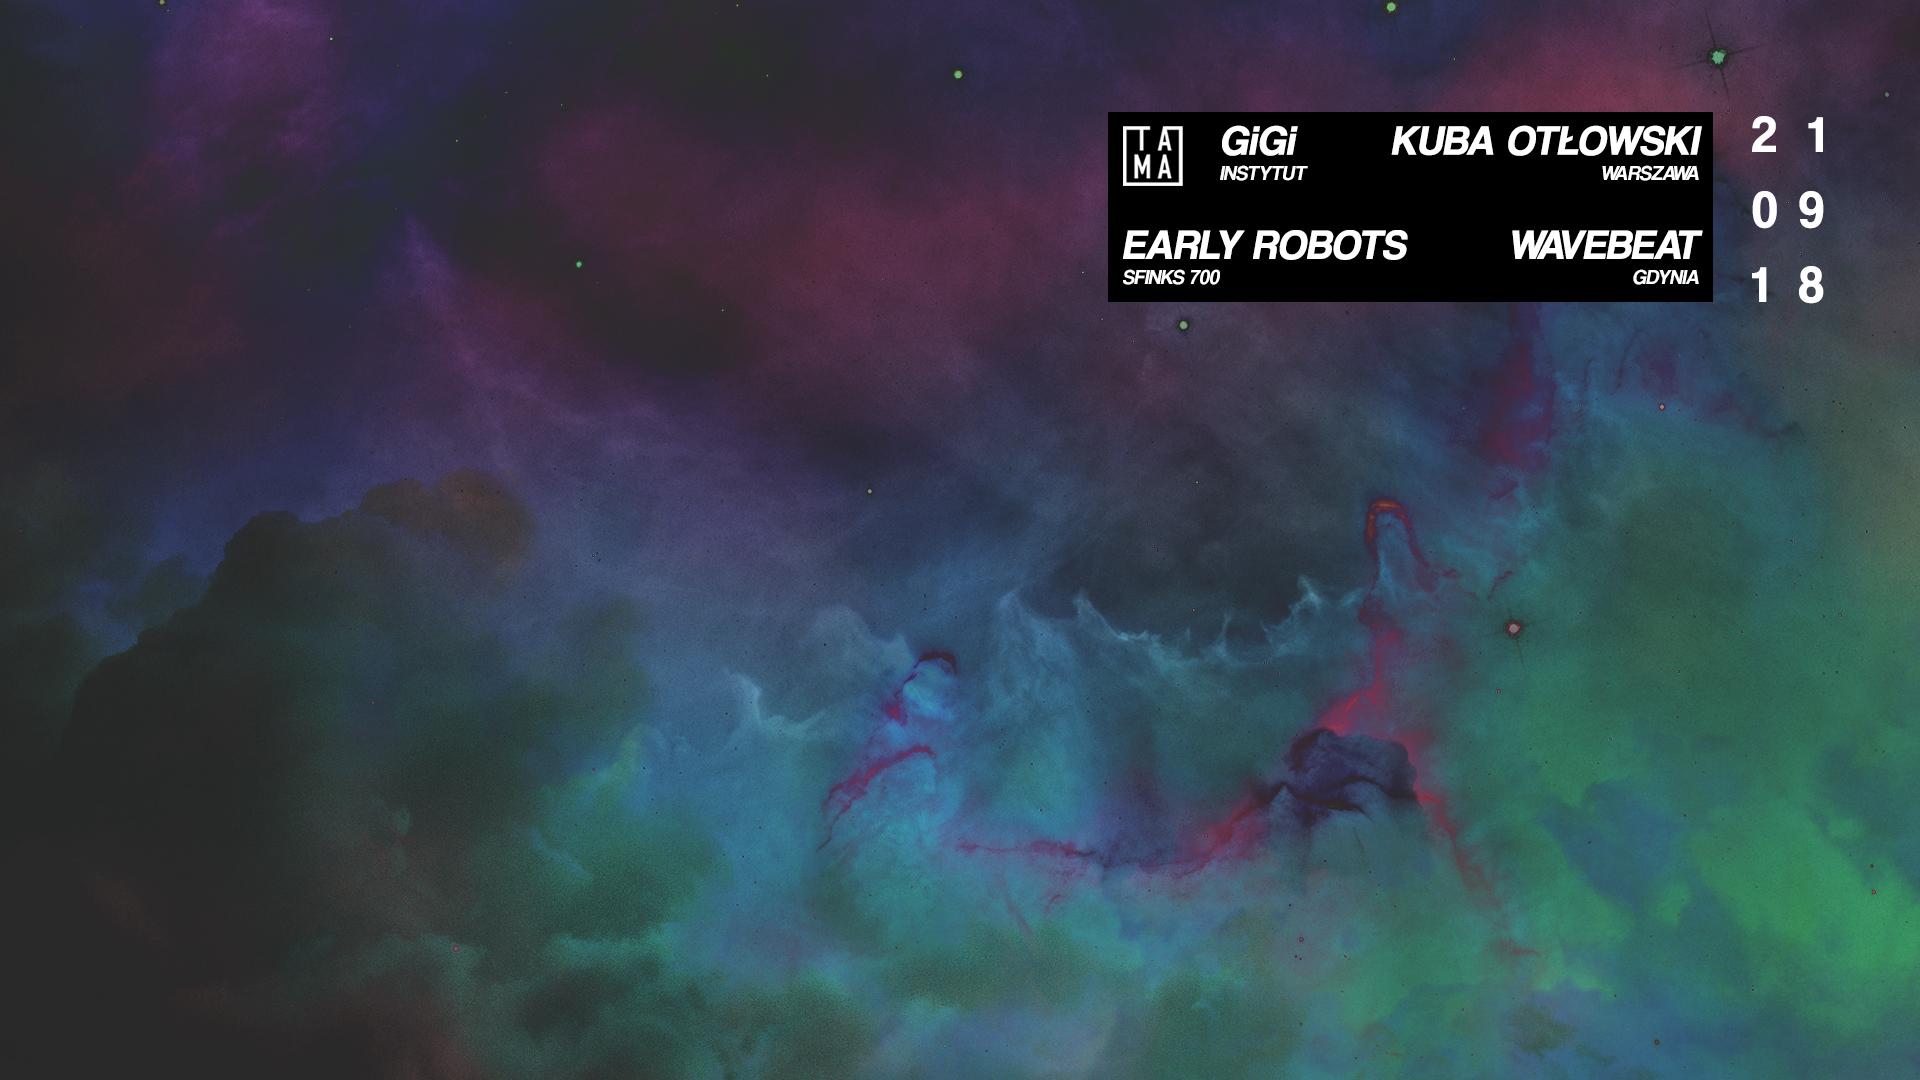 GiGi / Kuba Otłowski / Early Robots / wavebeat